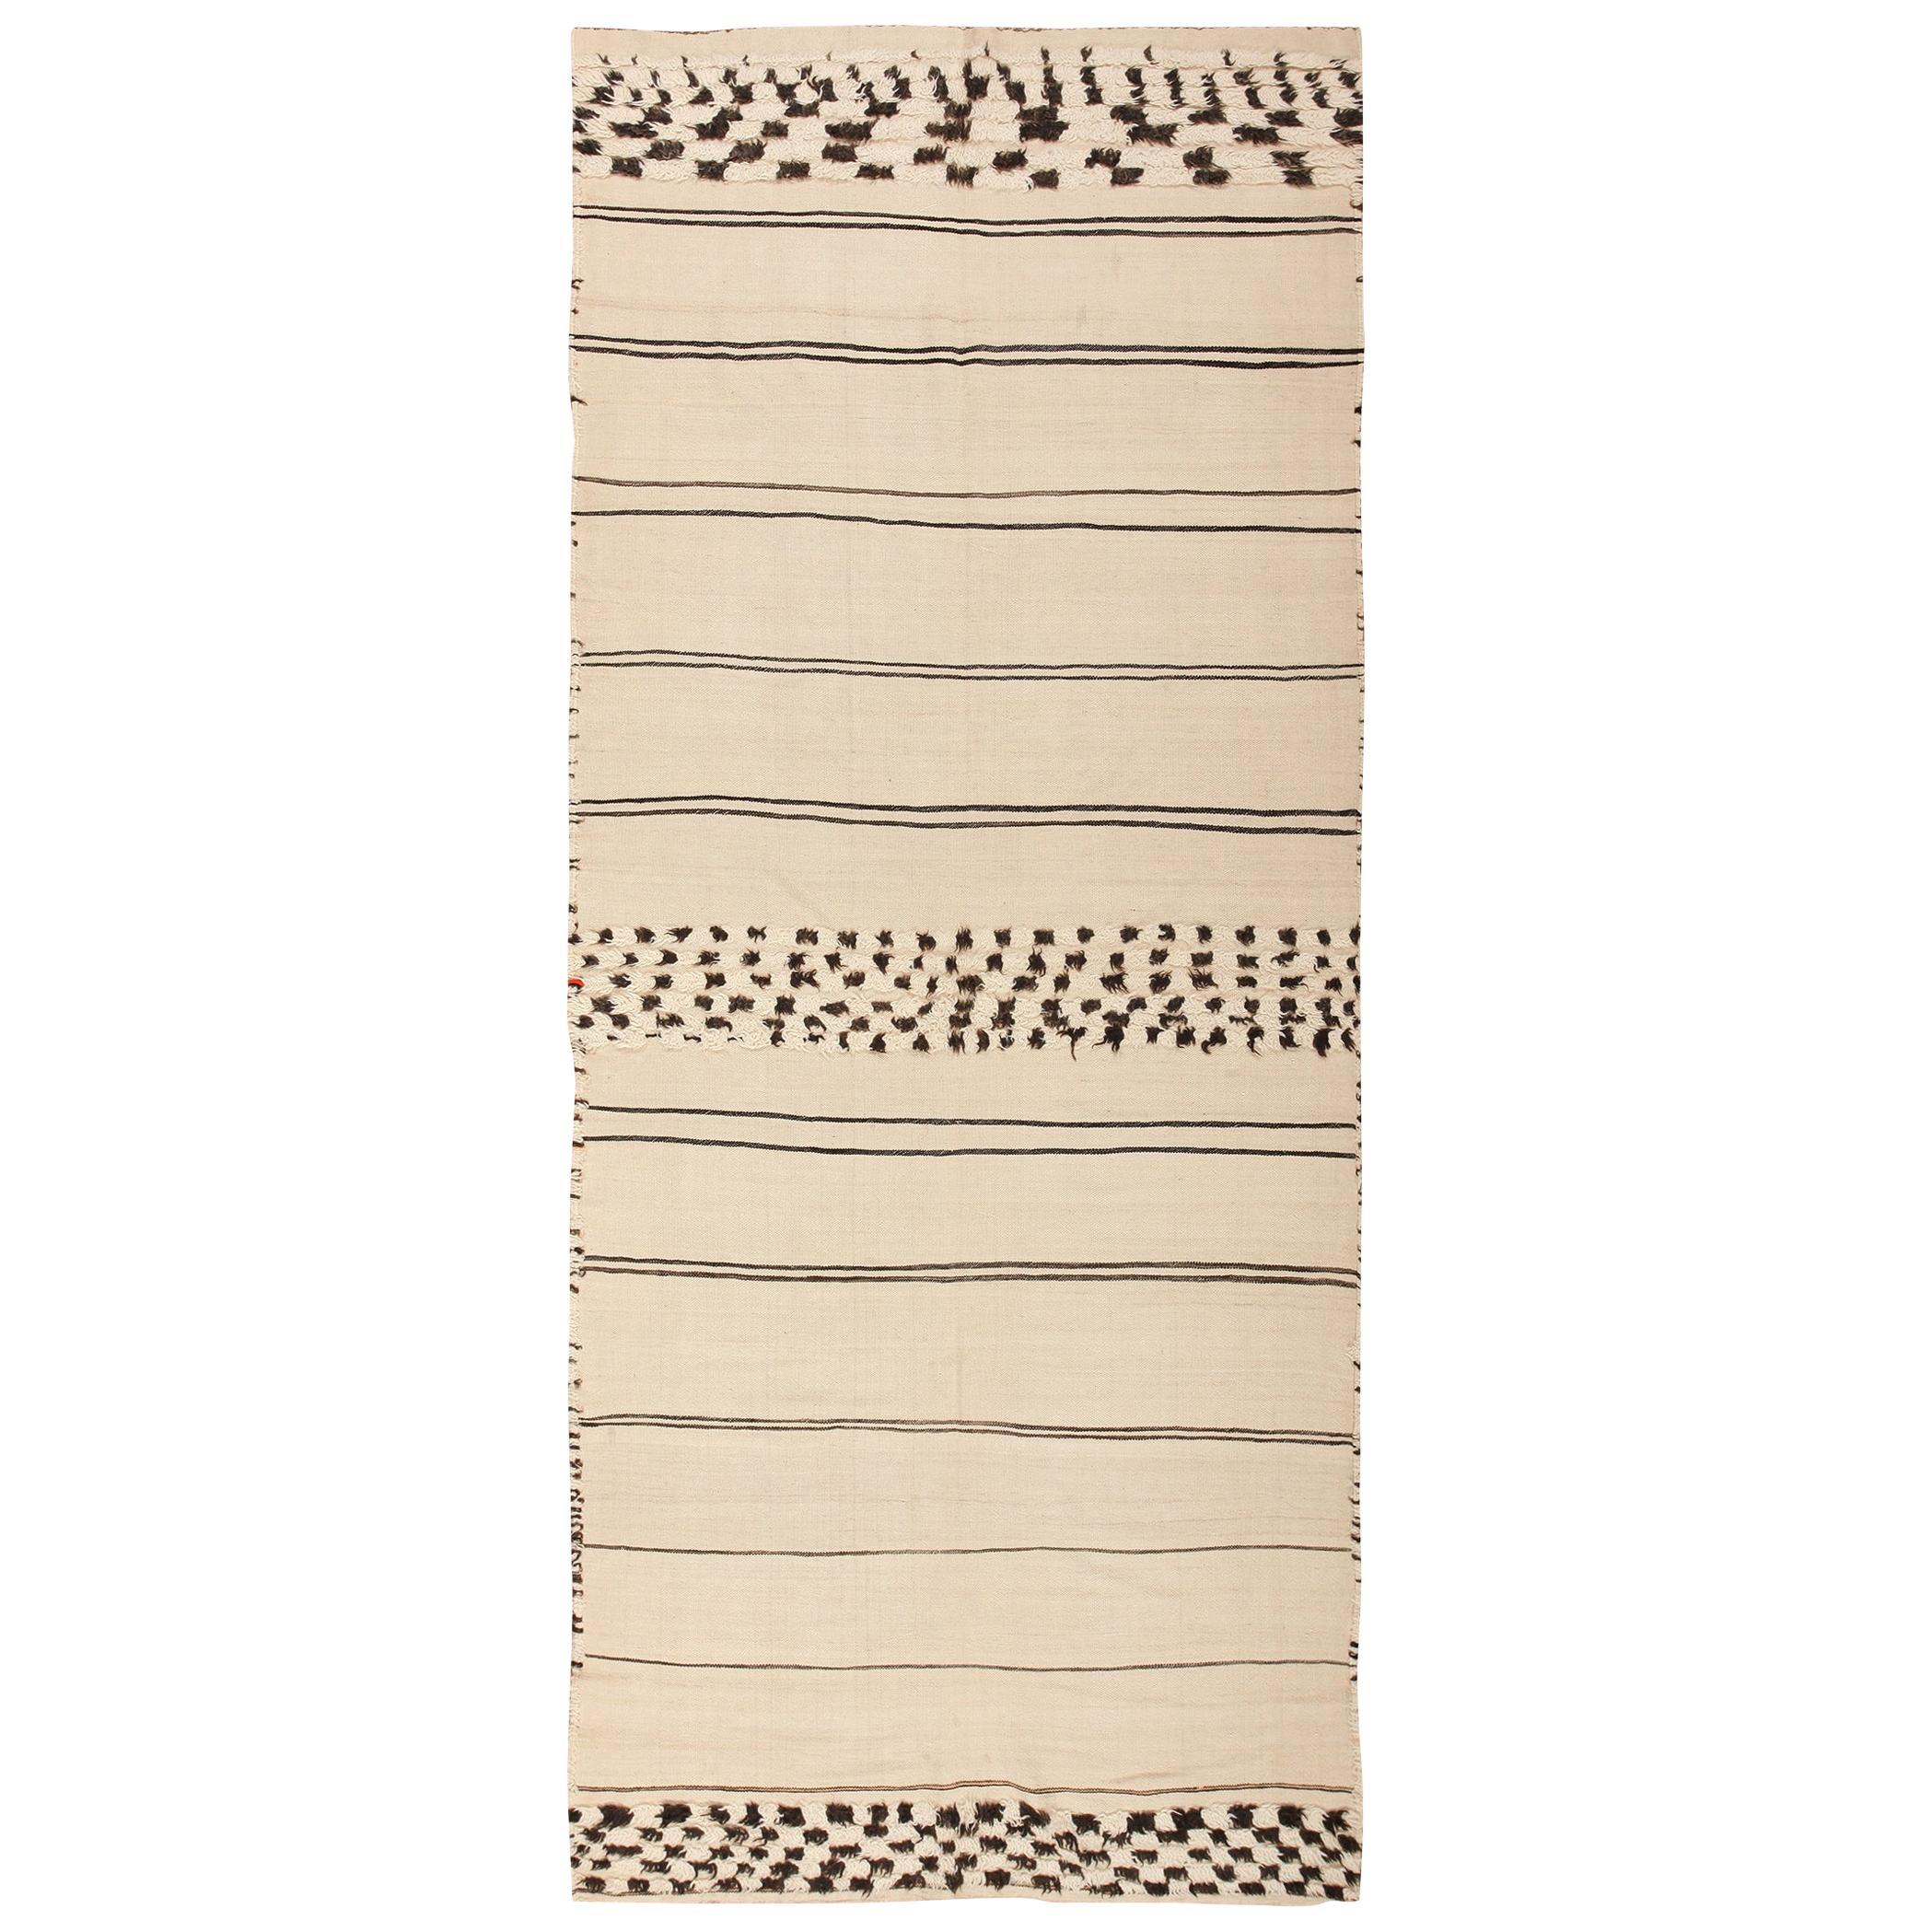 Ivory and Black Vintage Moroccan Kilim Rug